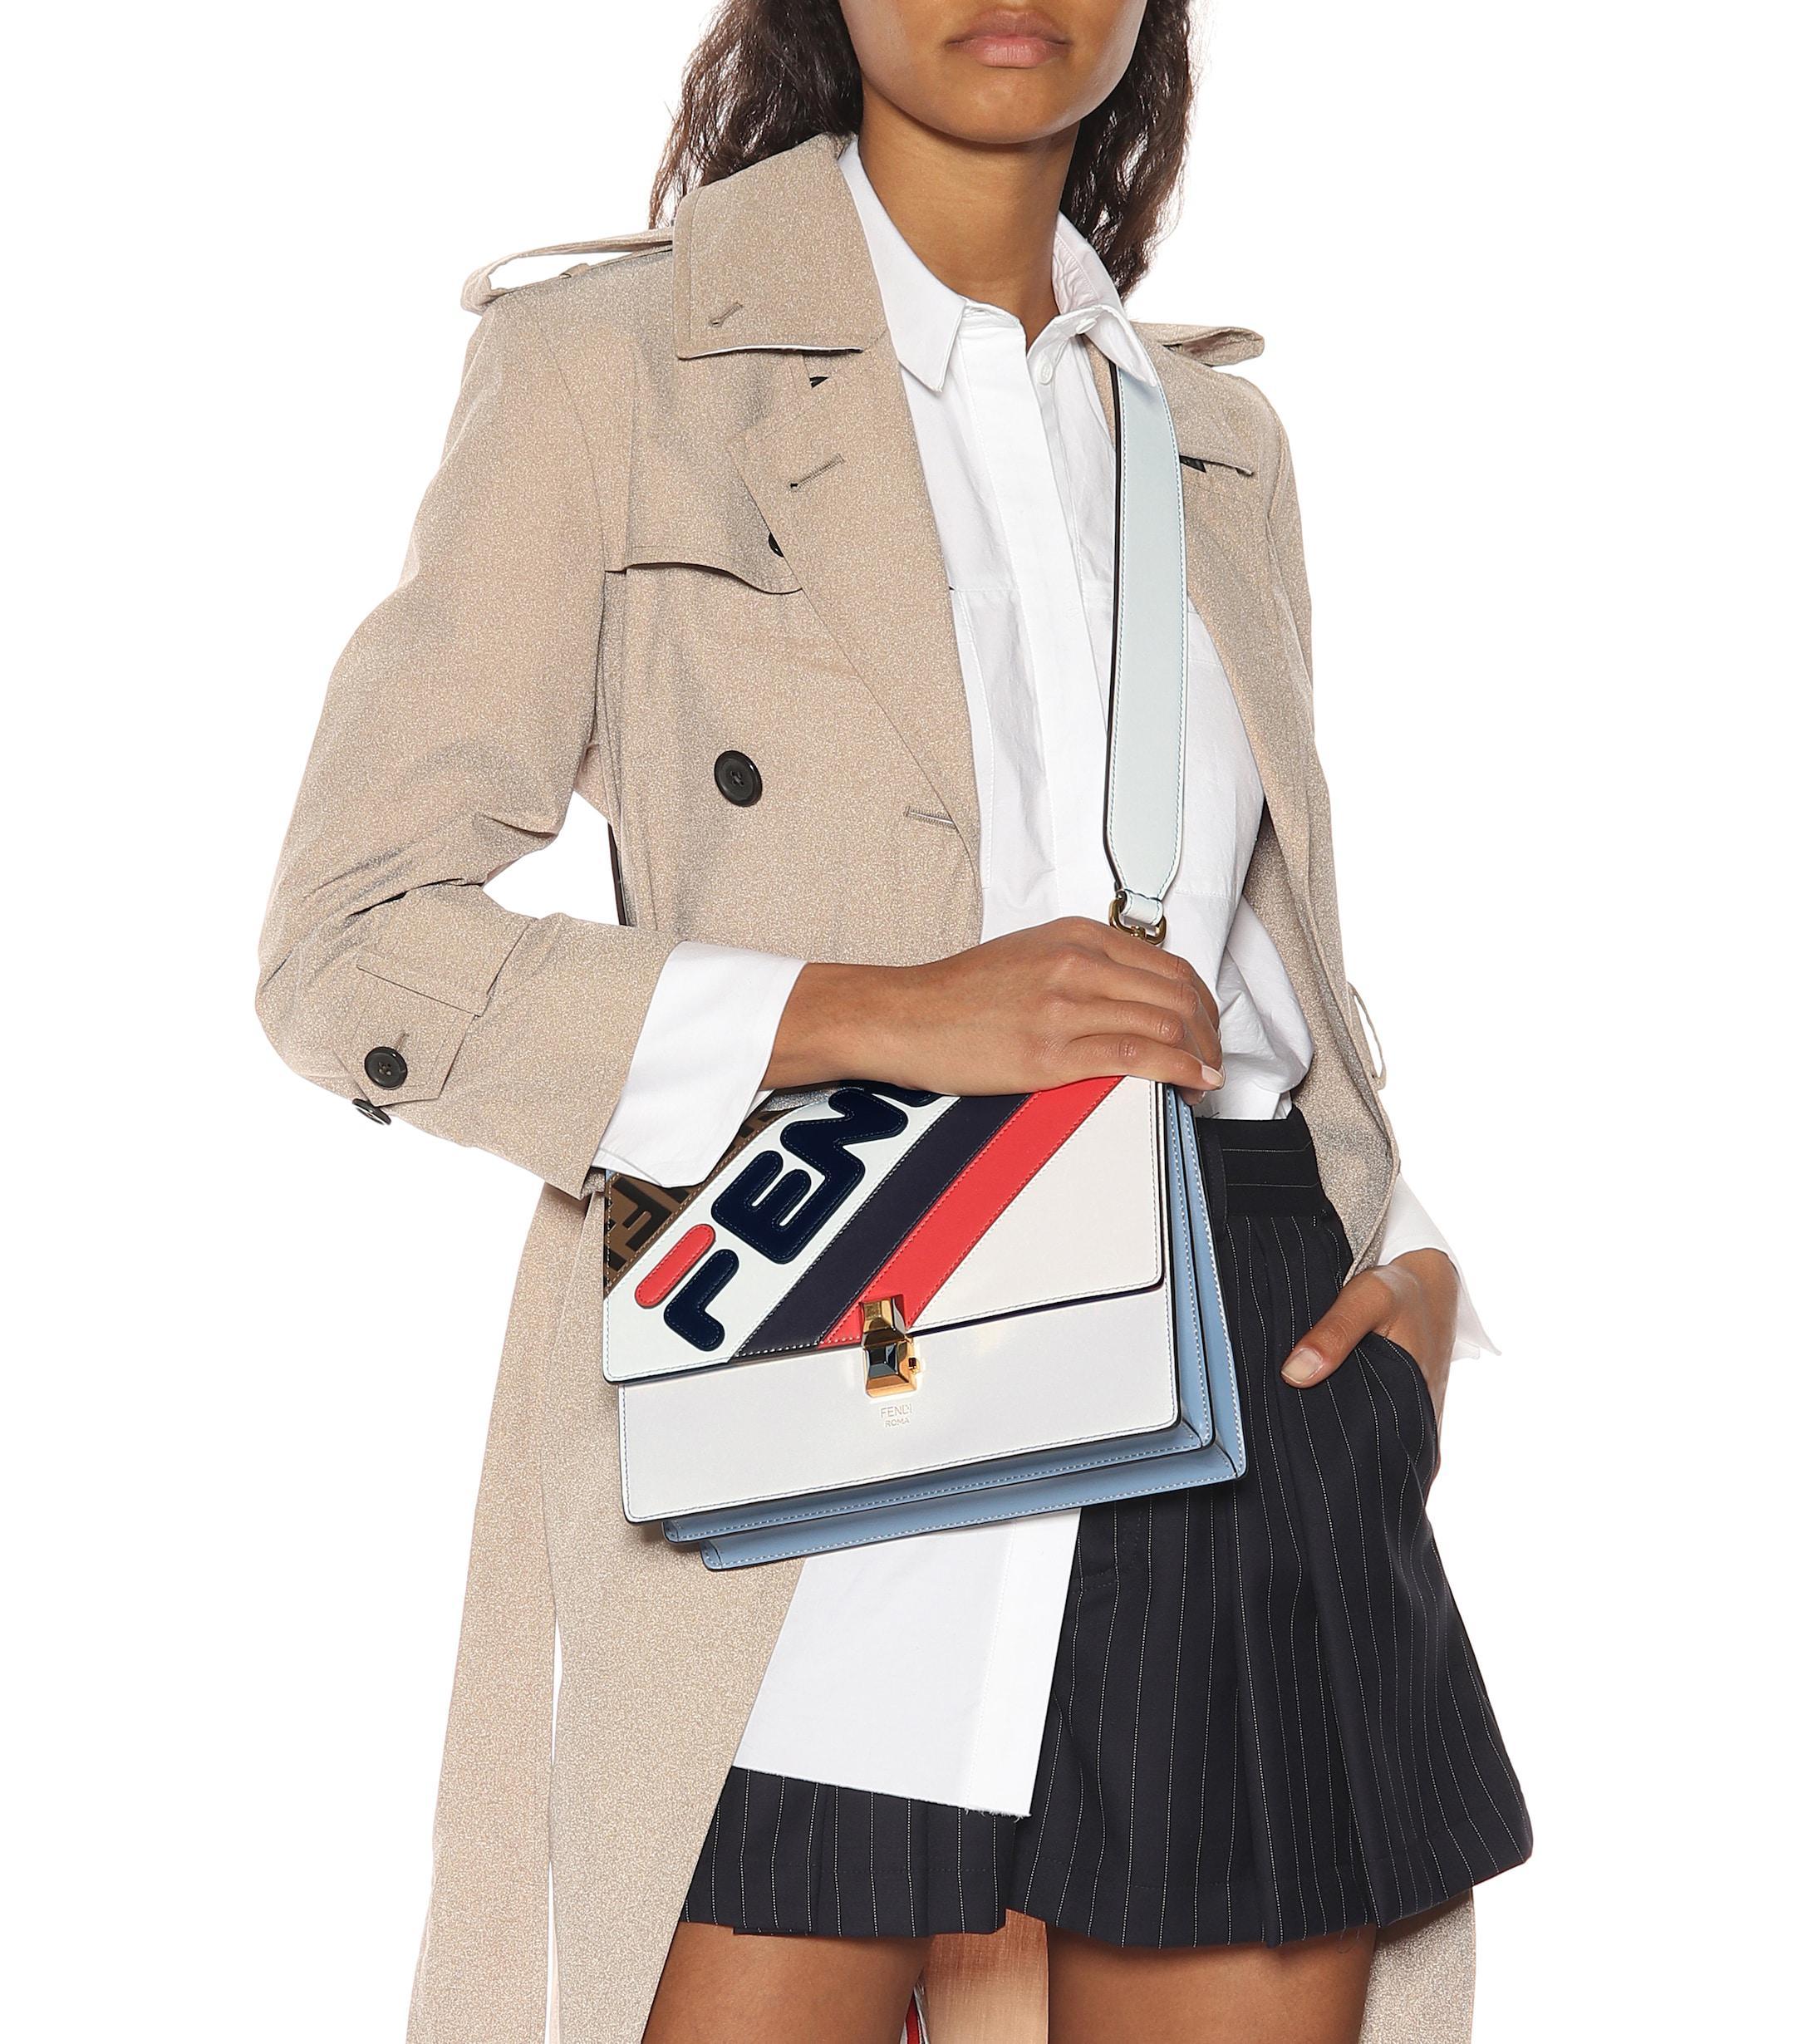 994af04cb43a Fendi - Multicolor Mania Kan I Leather Shoulder Bag - Lyst. View fullscreen